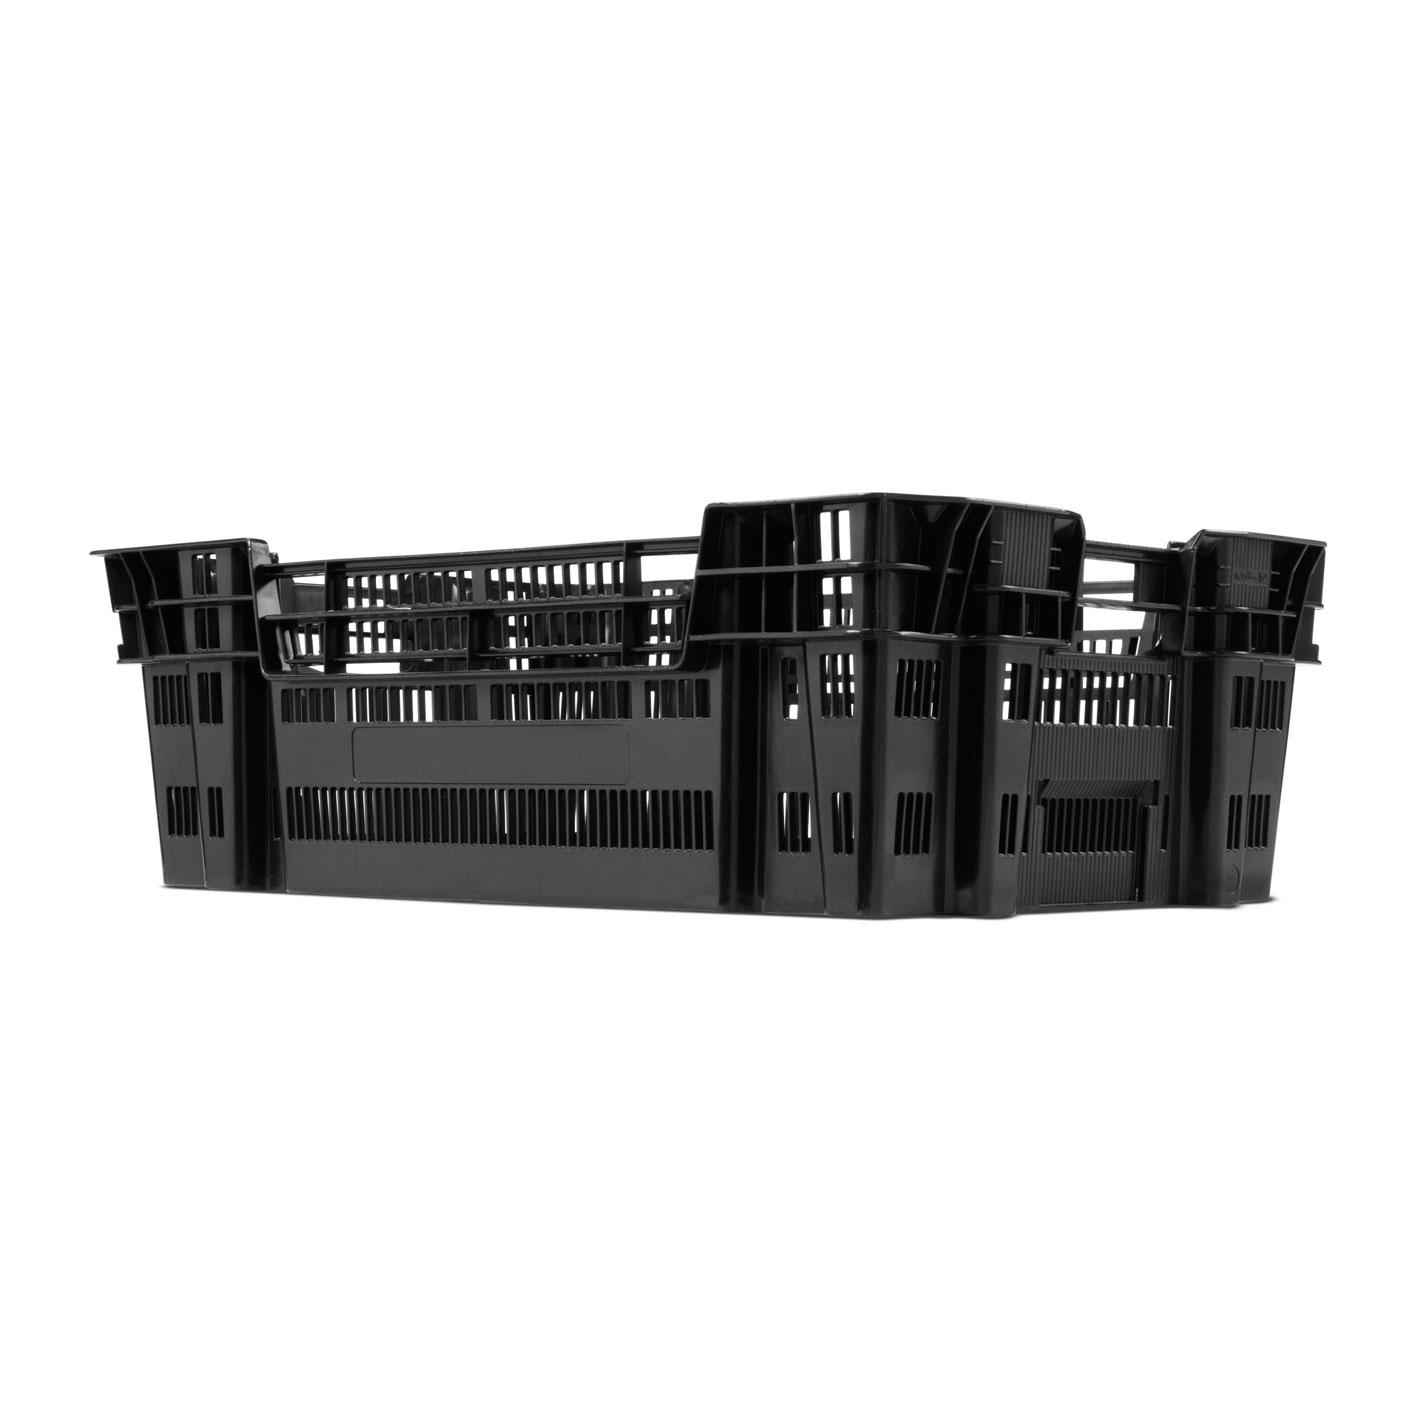 34 litre reversible crate